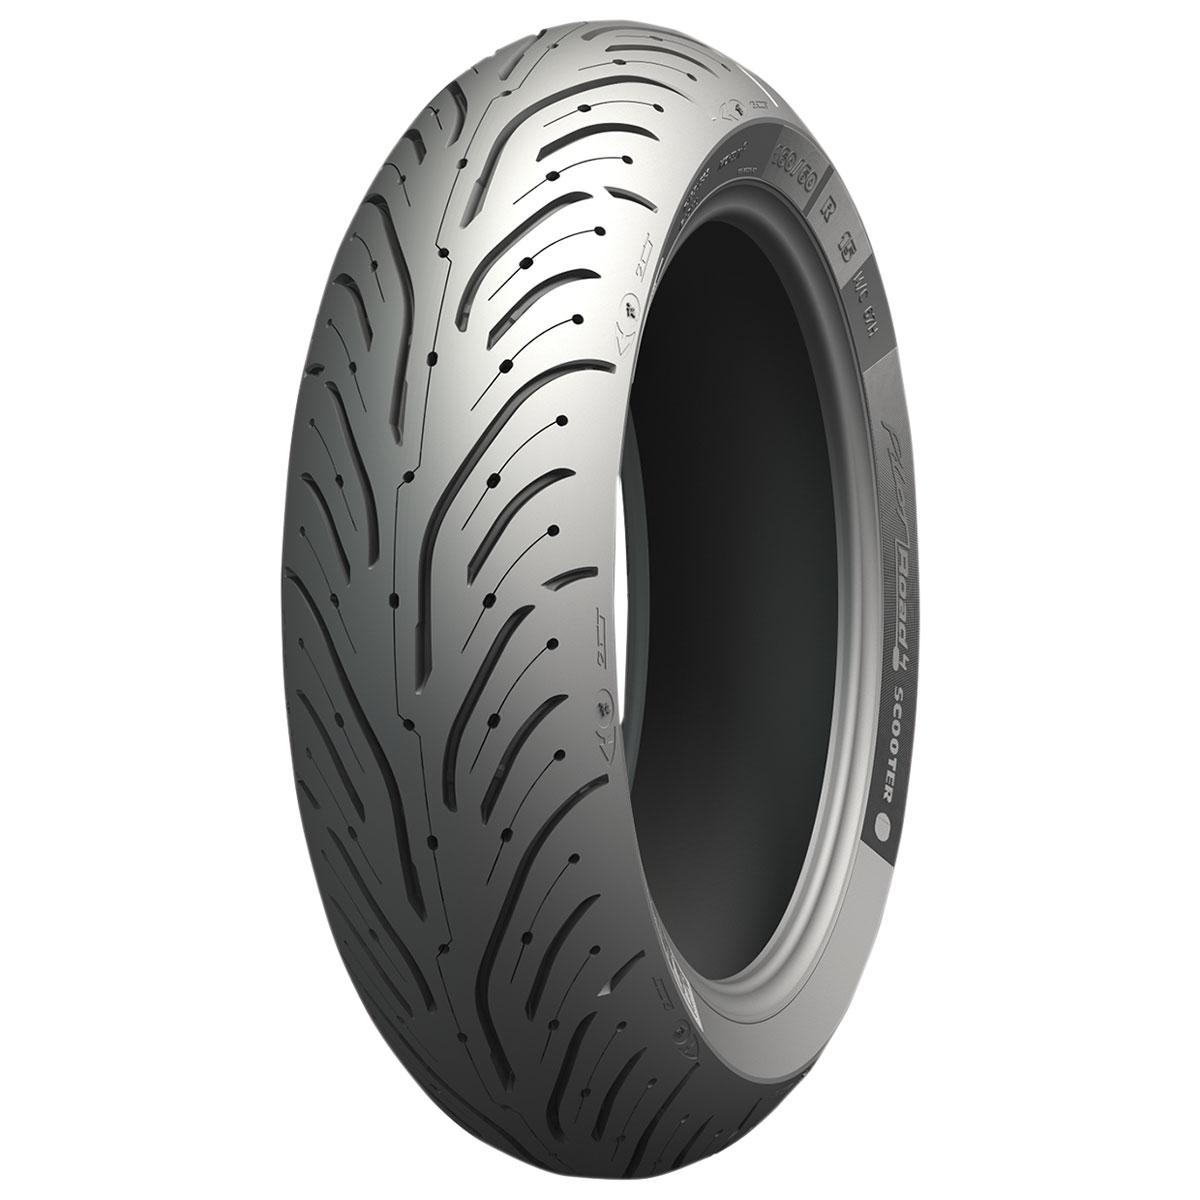 Michelin Pilot Road 4 160/60R14 Rear Tire